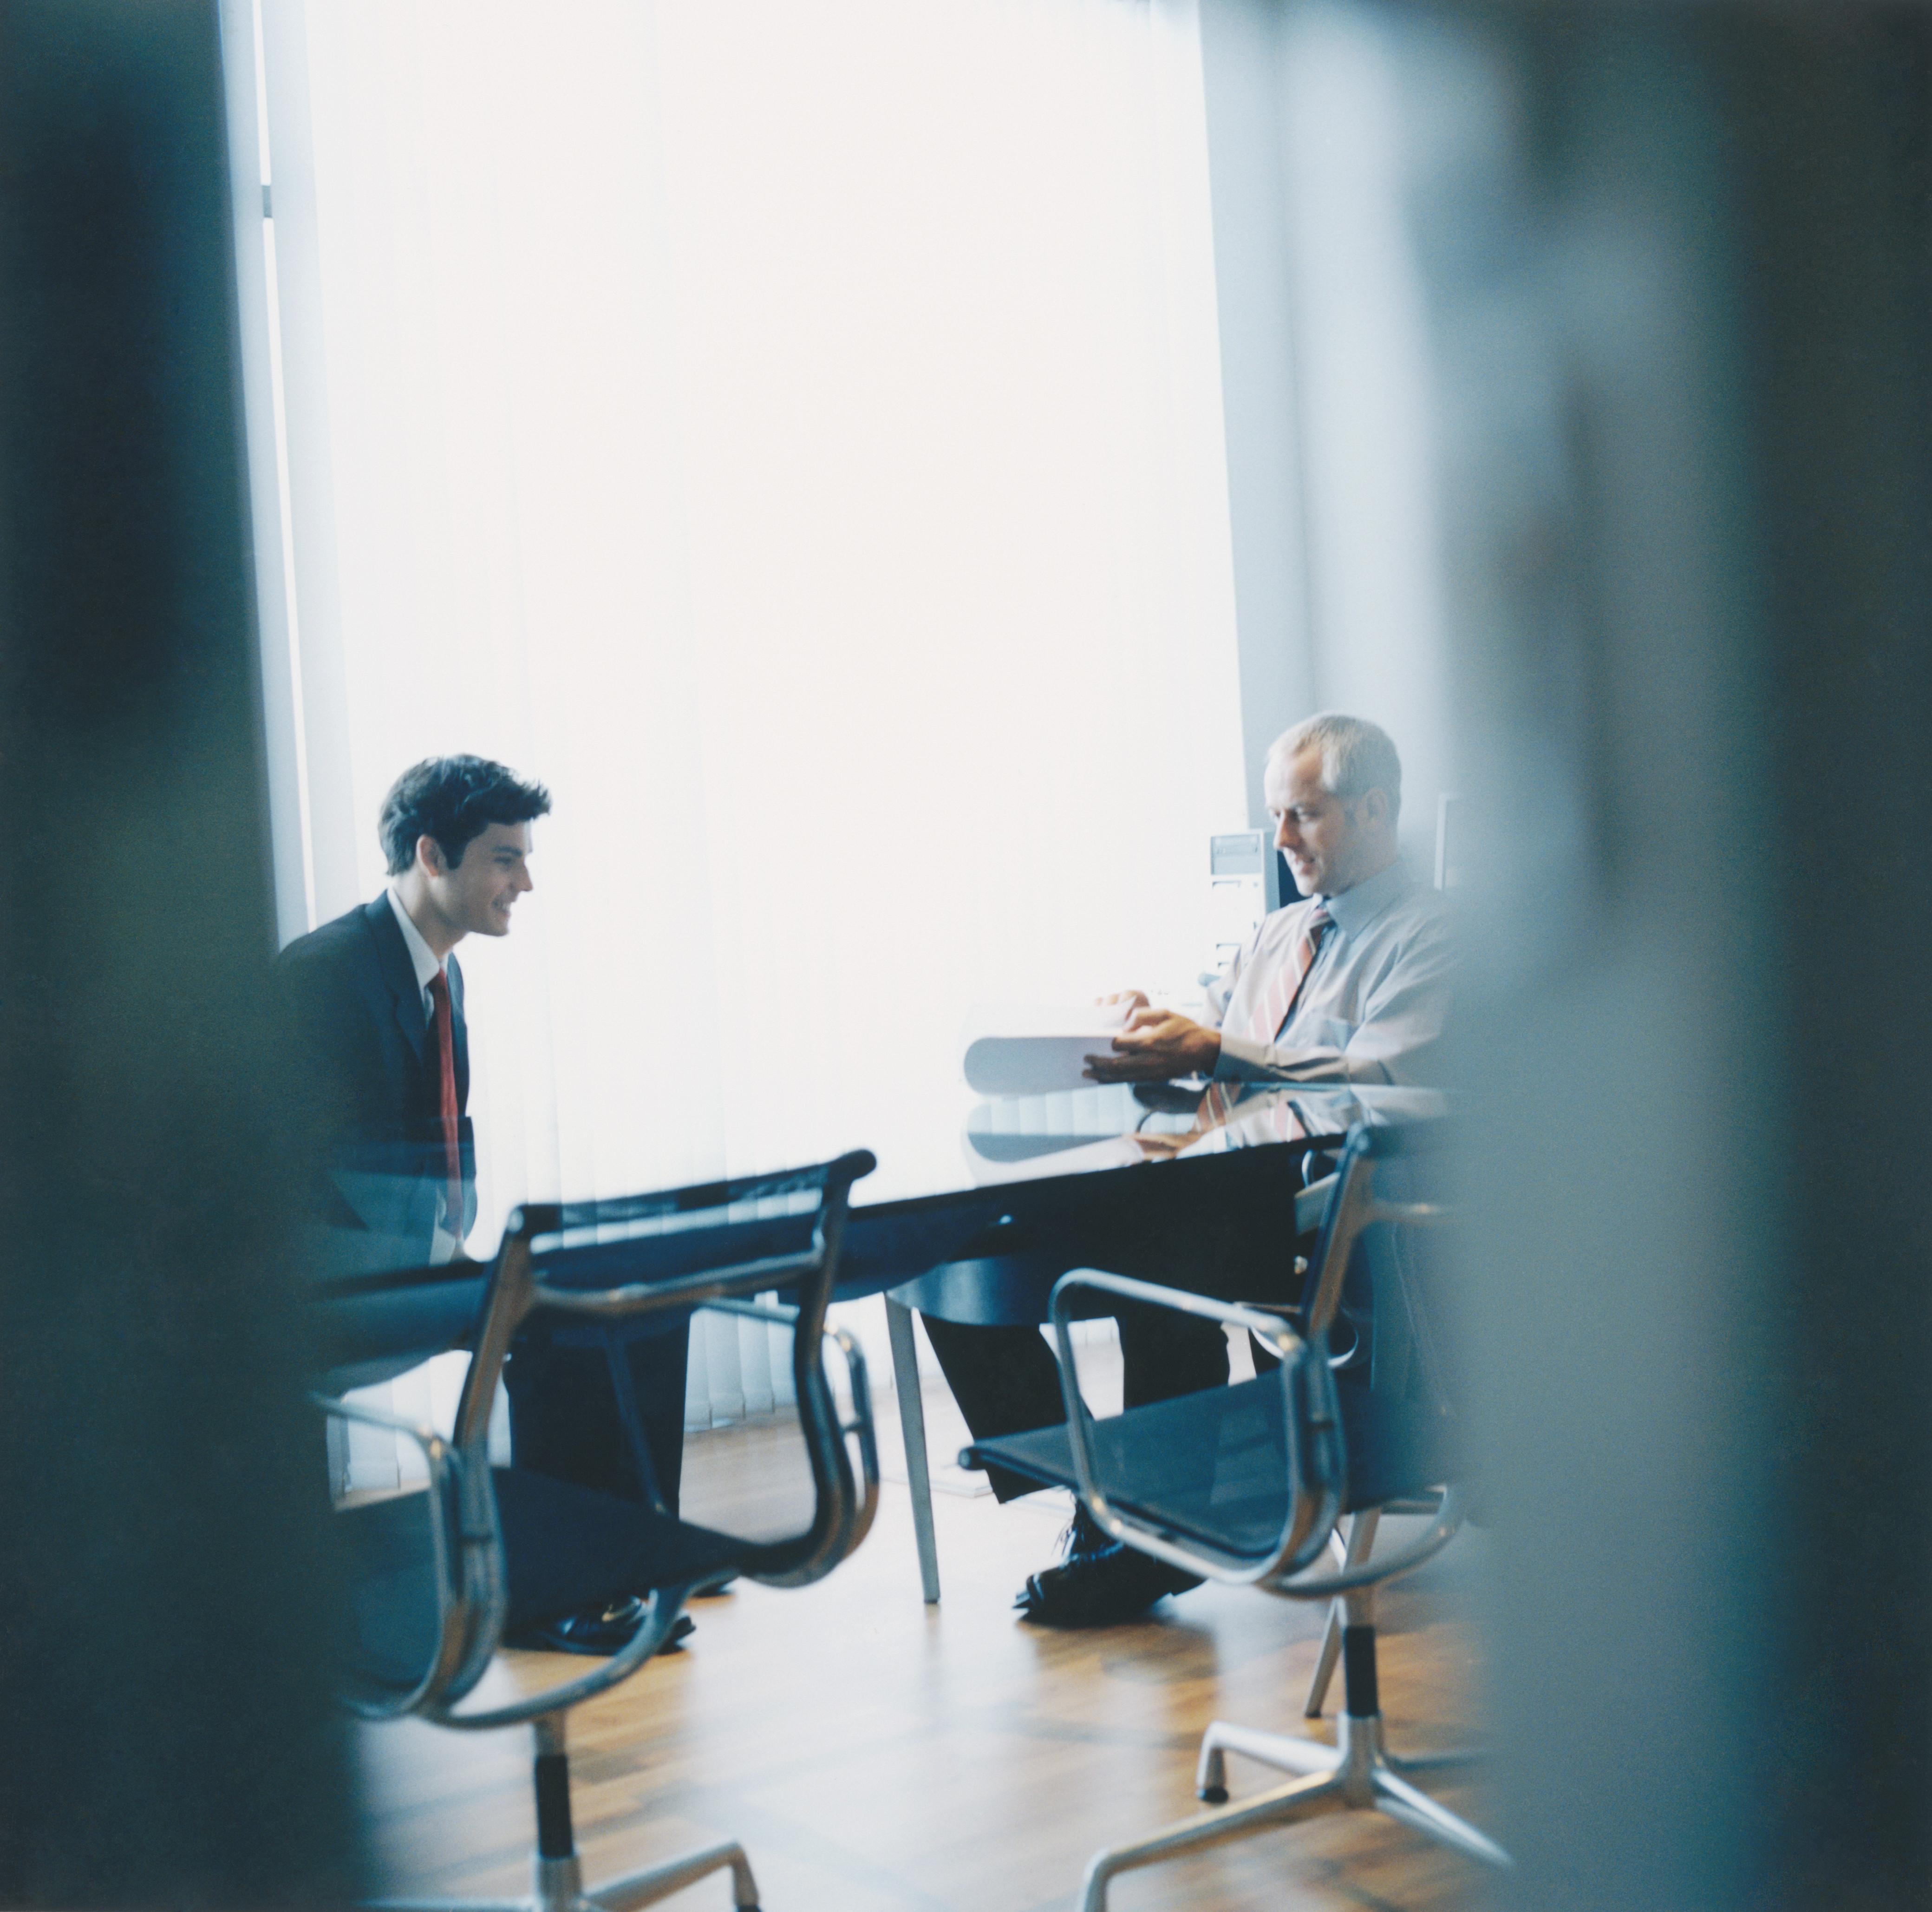 Men at Interview